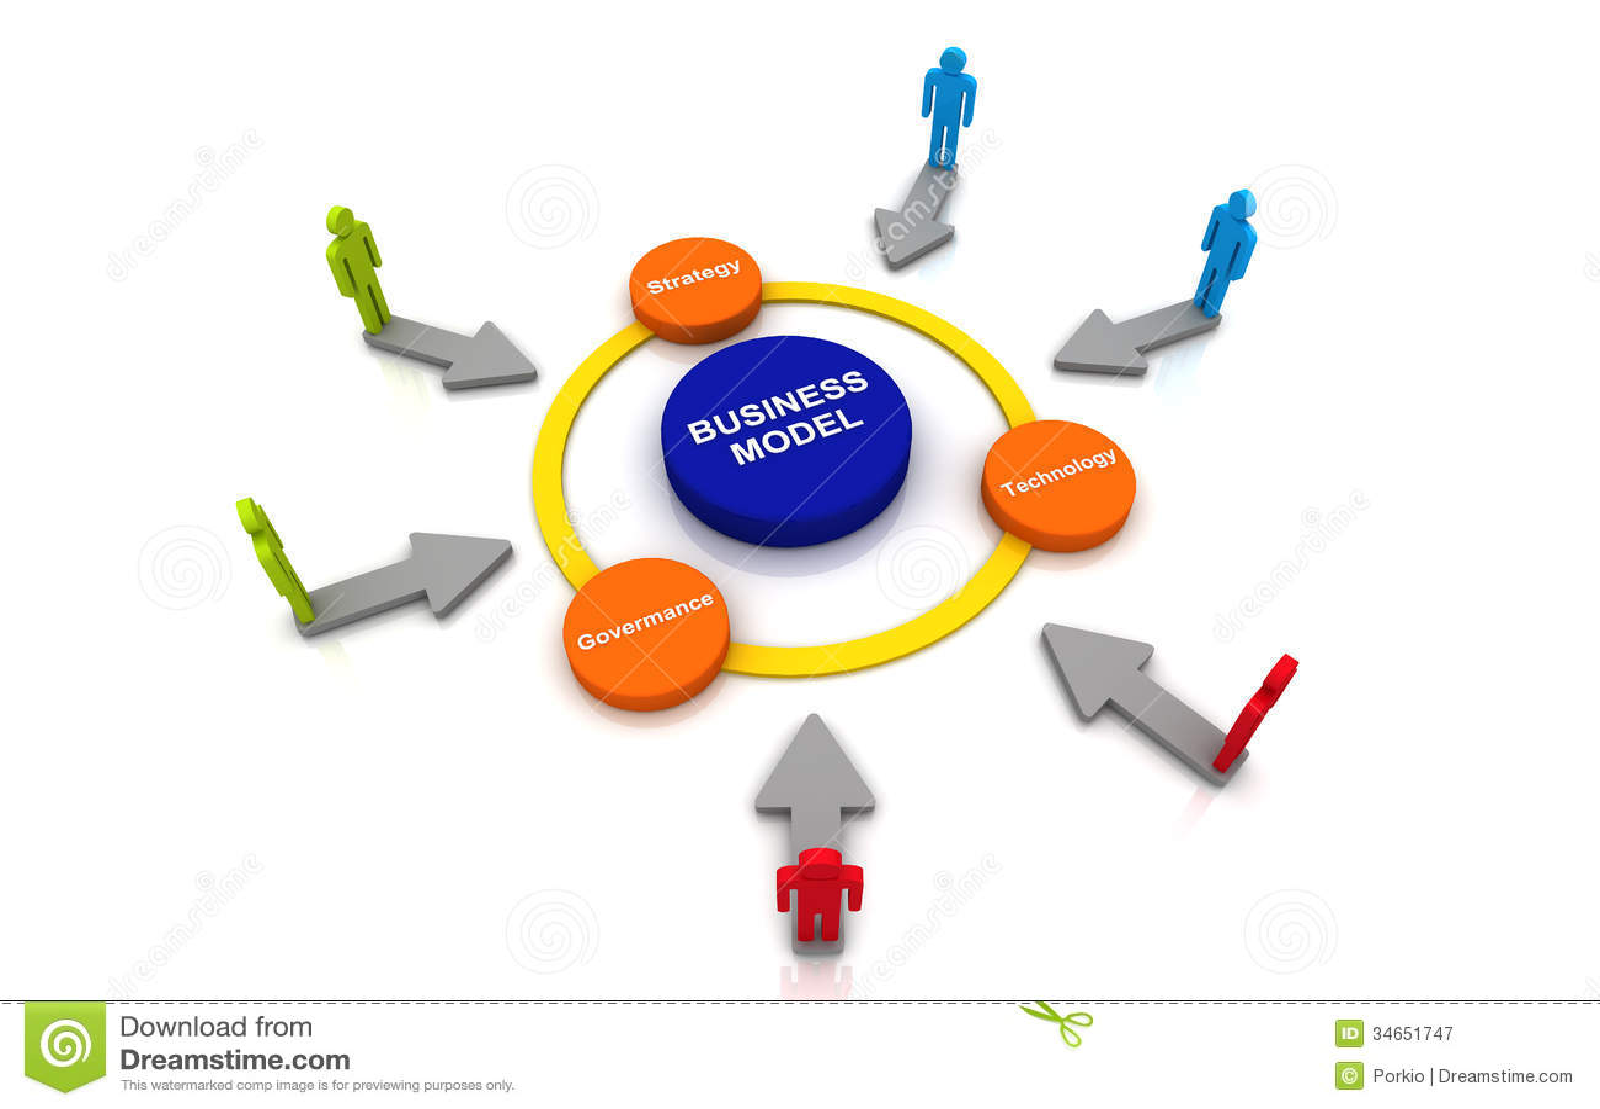 Business Model Plan    Diagram    Connection Background Human Stock Illustration  Illustration  34651747